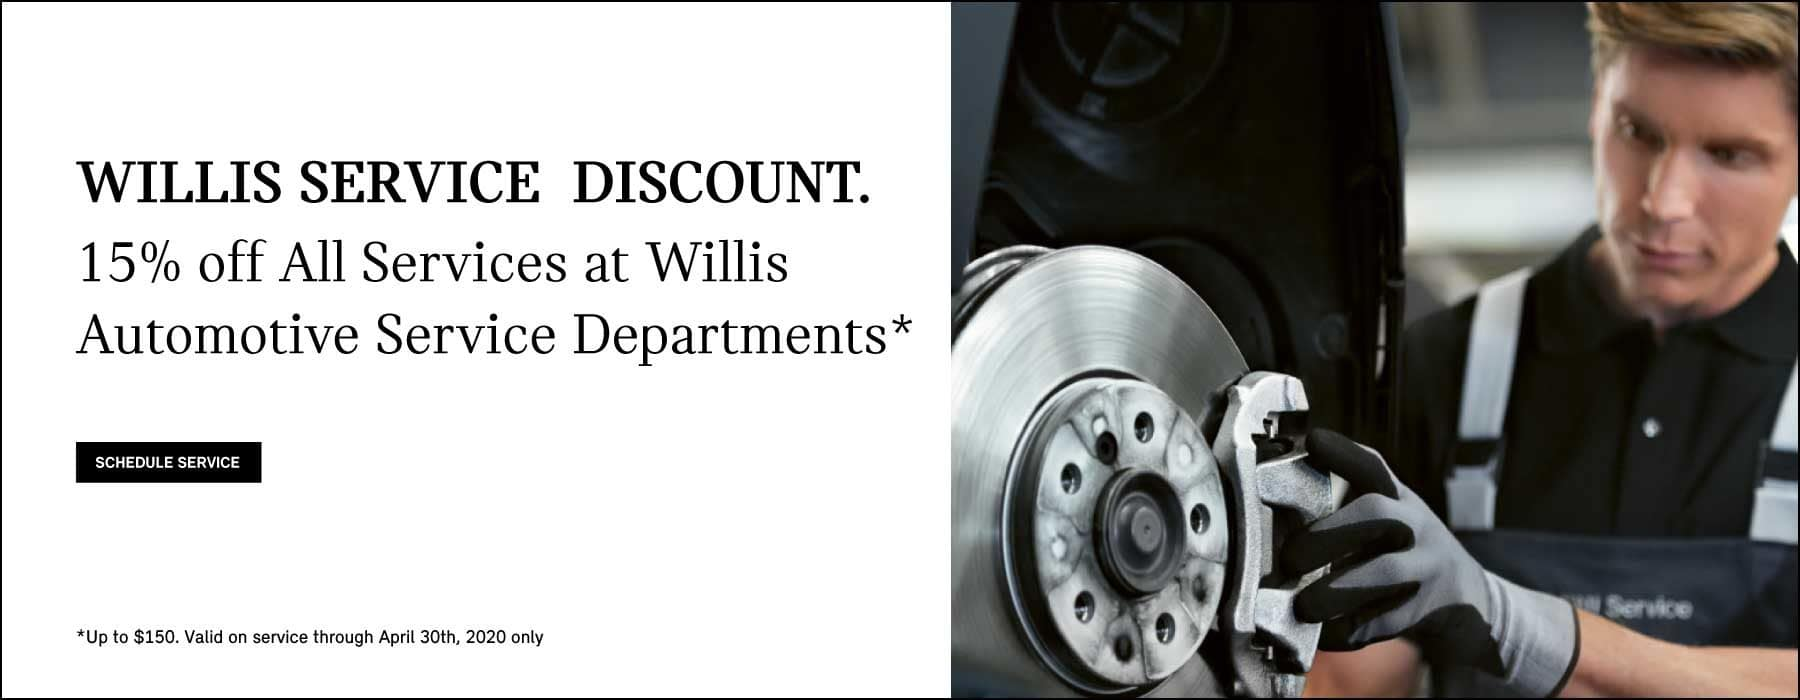 willis discount on service